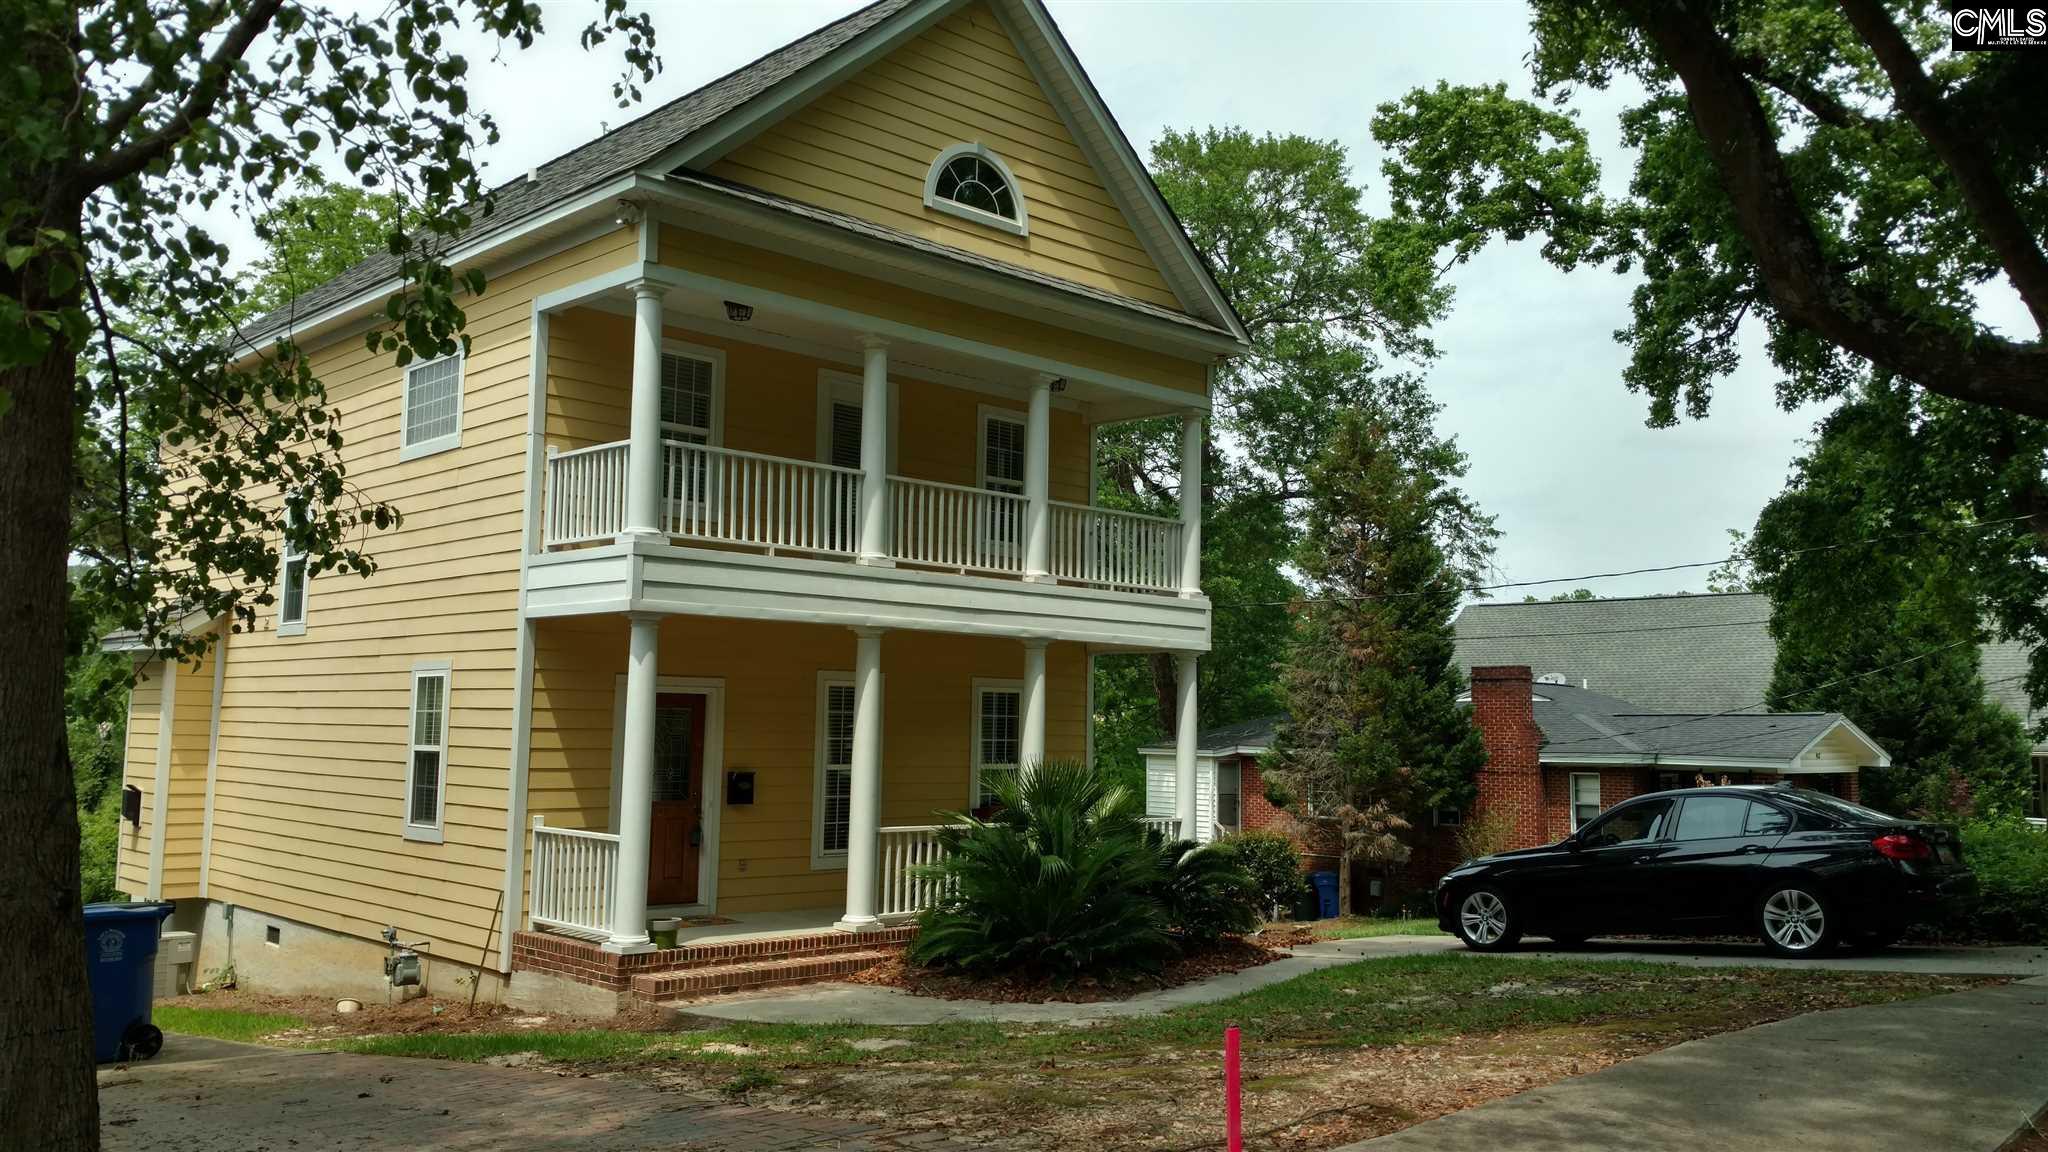 907 W Confederate Columbia, SC 29201